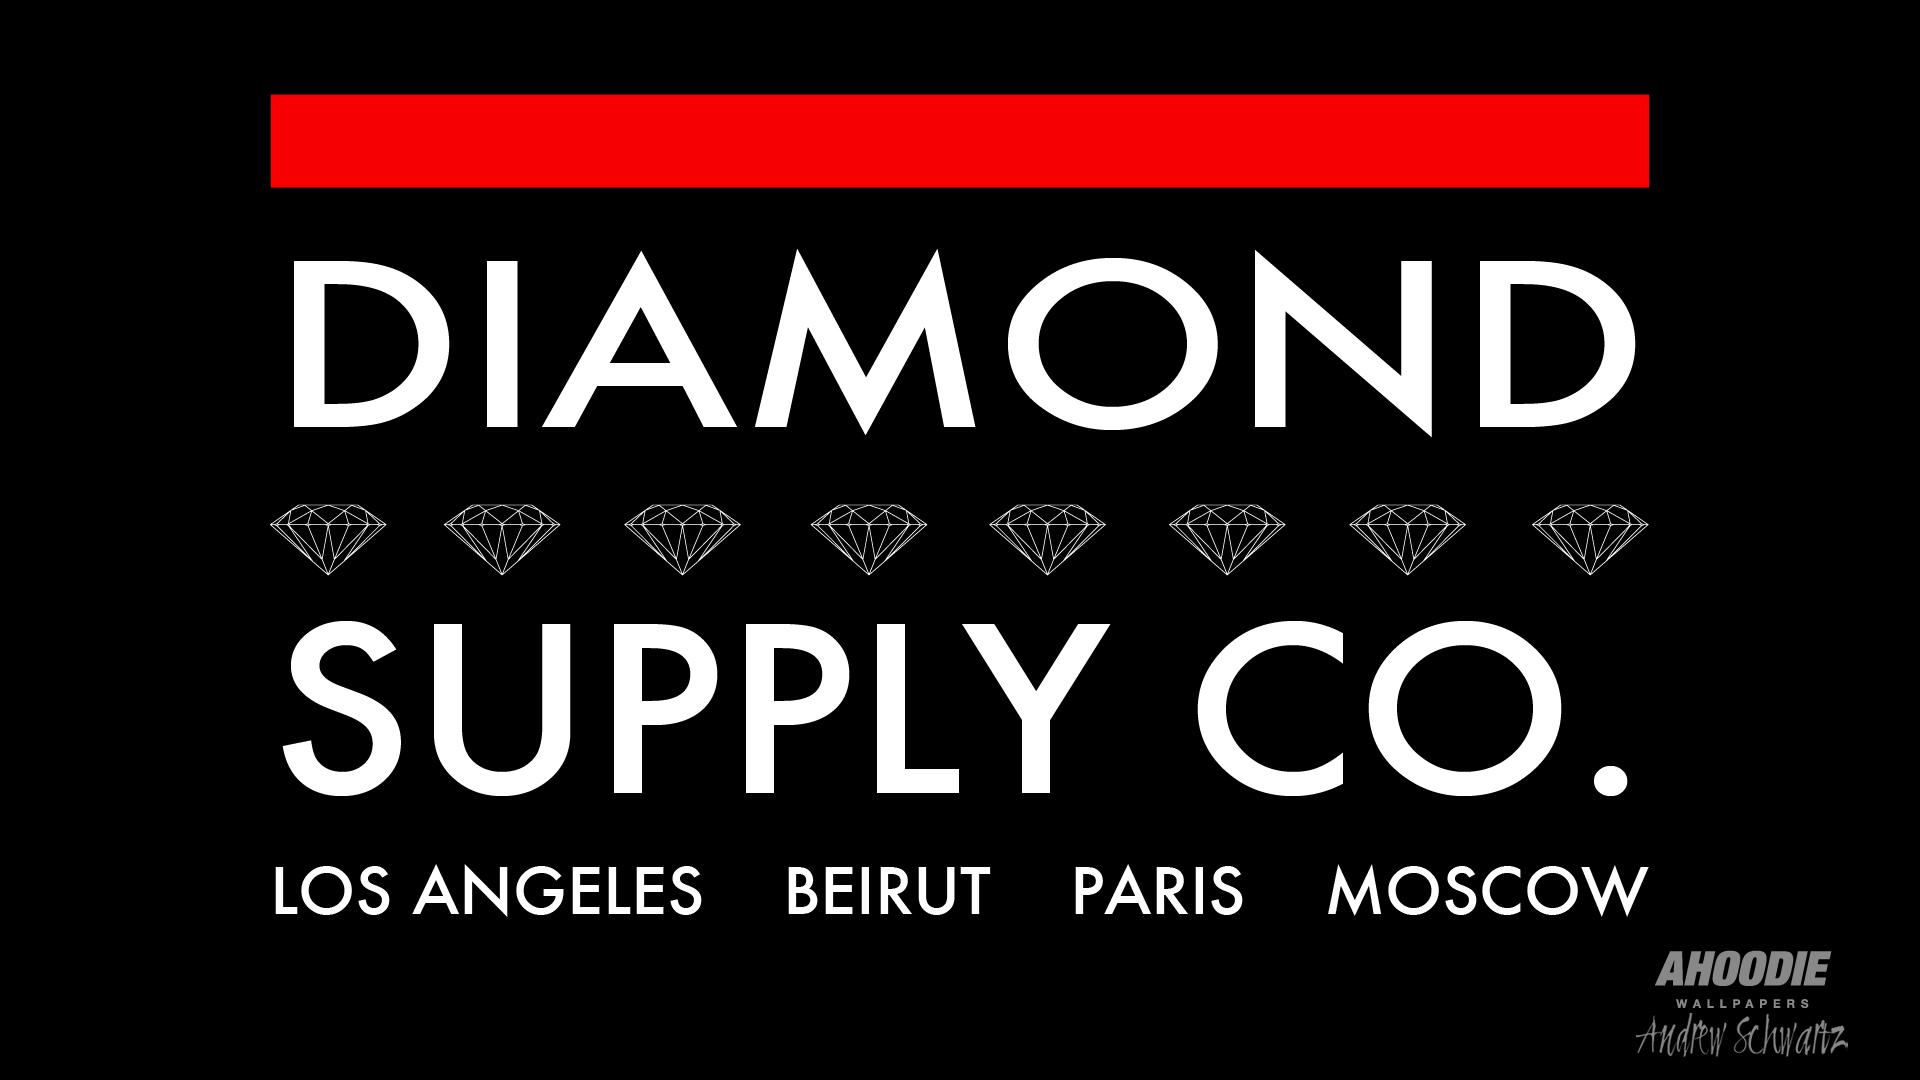 Diamond Supply co. - photo#12